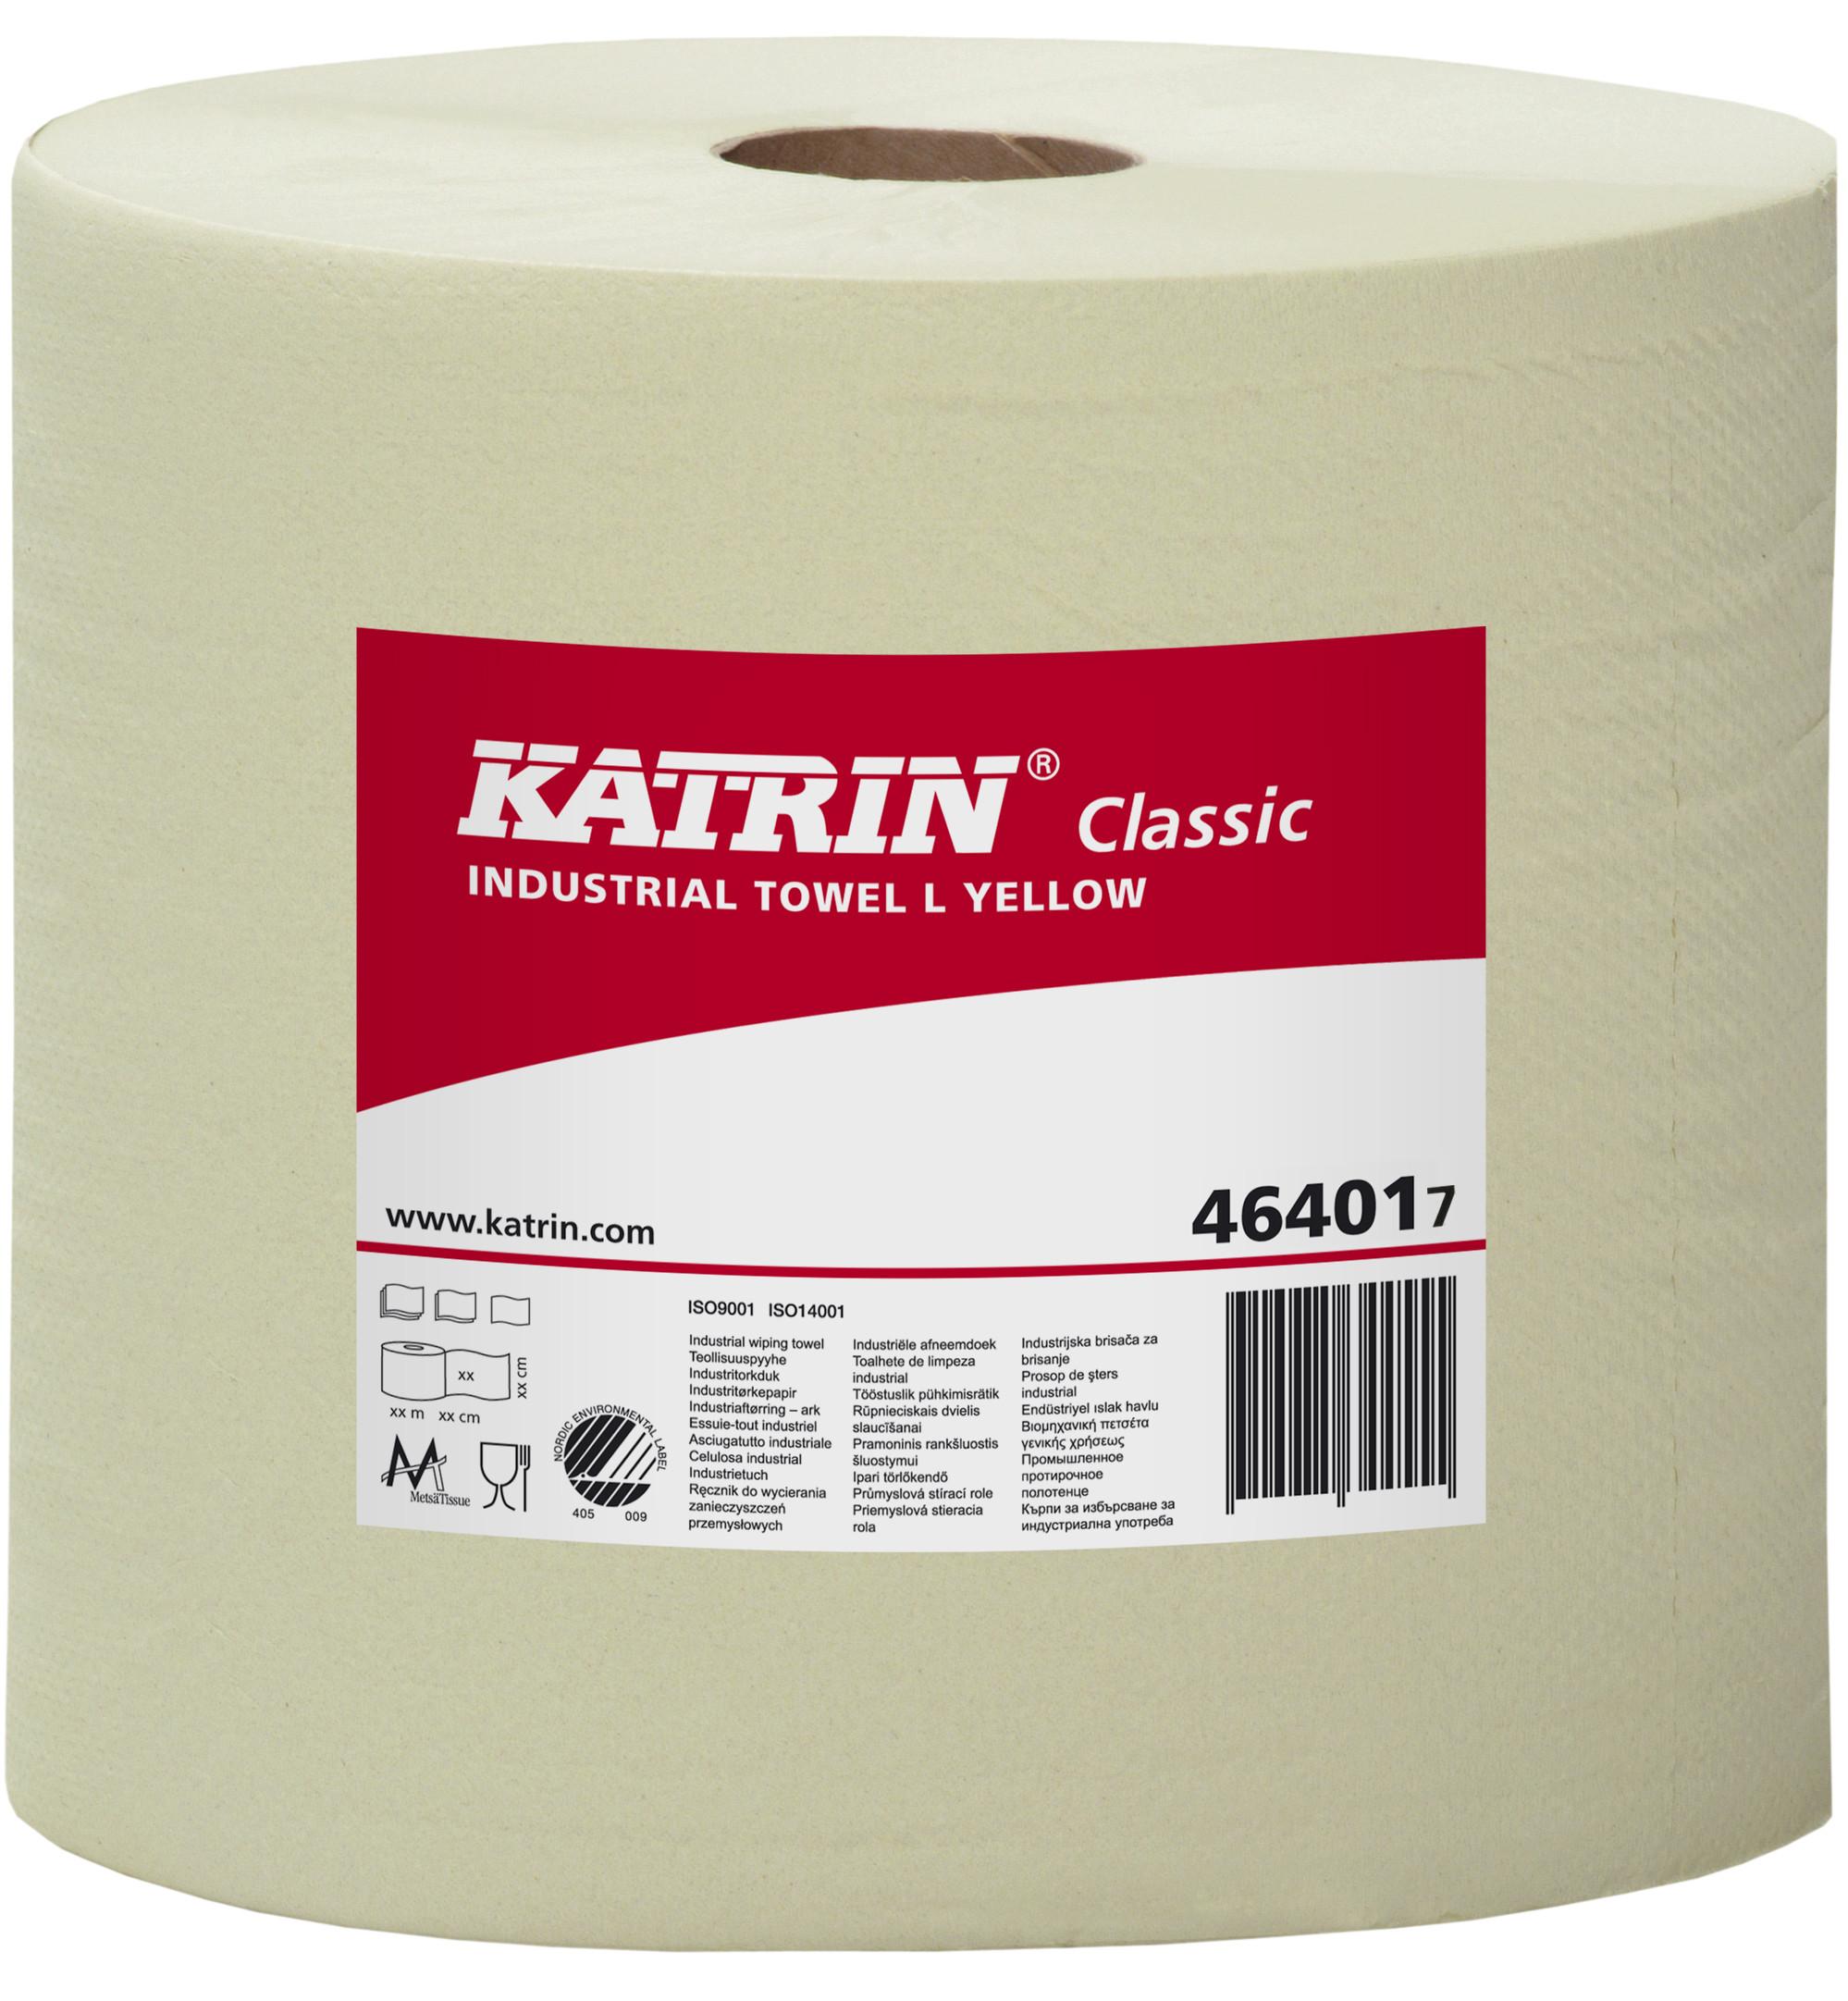 Katrin Classic Industrial Towel L Yellow